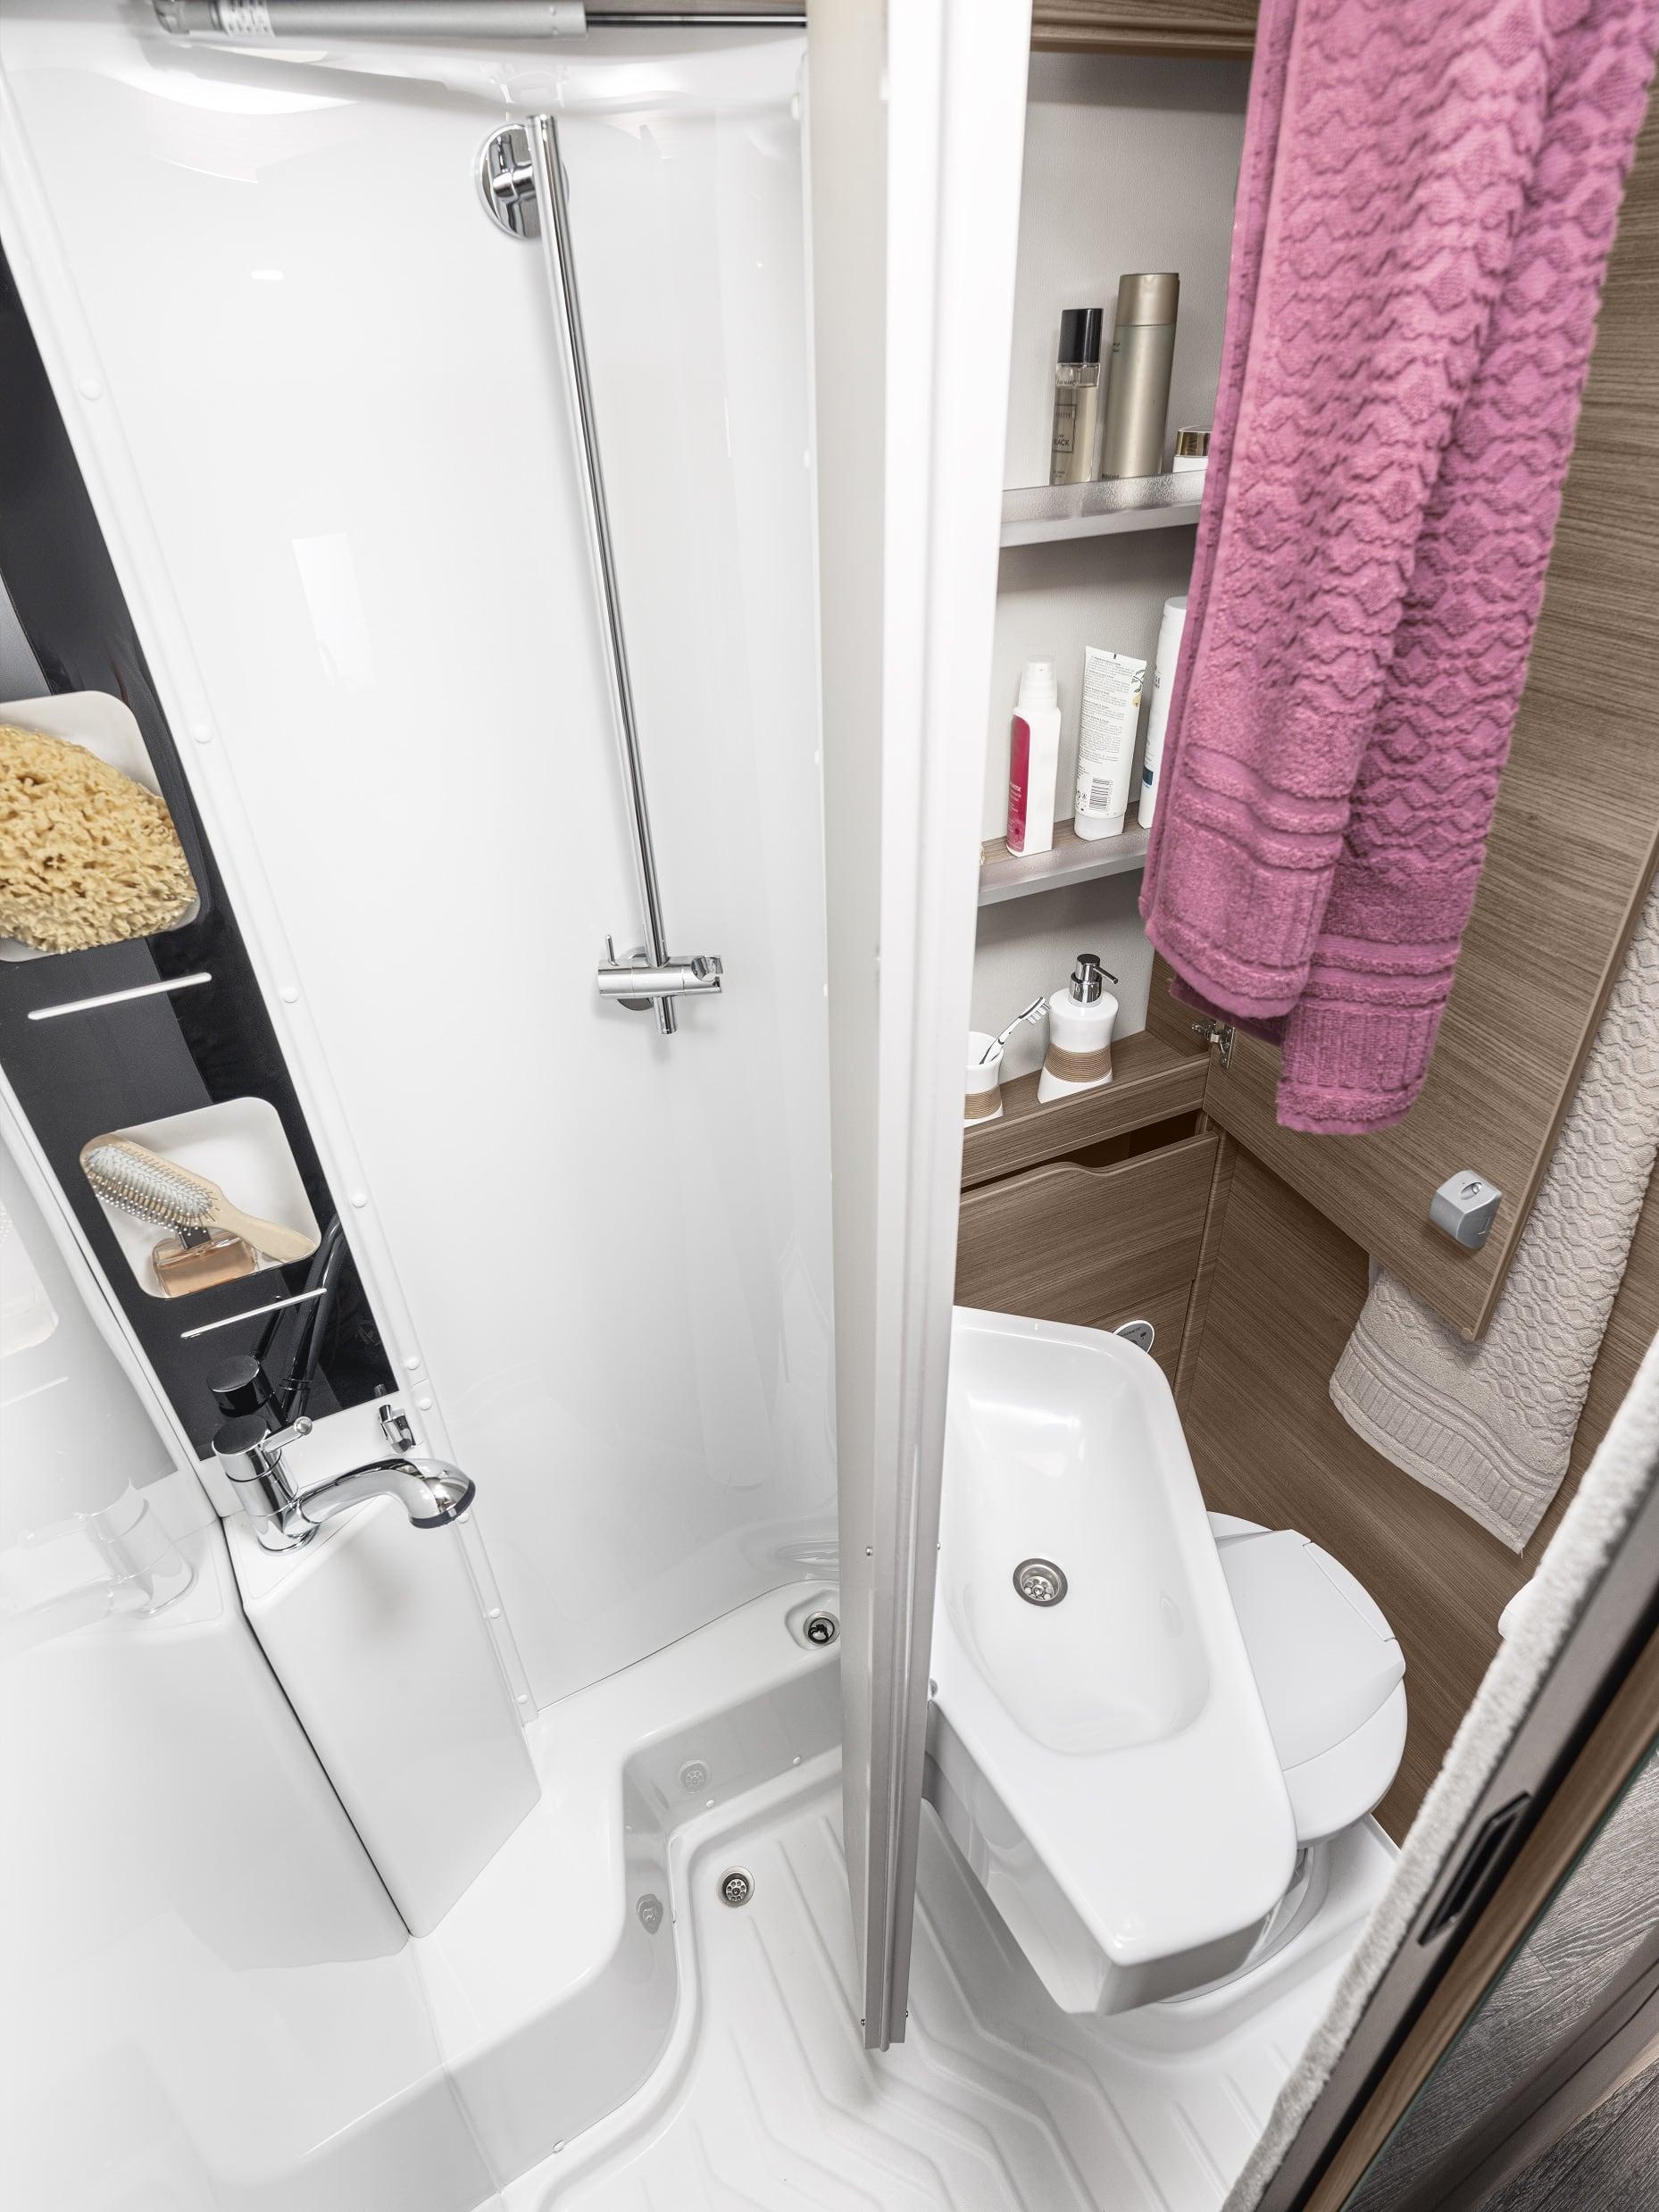 Die Klapp-Rückwand im Bad des VAN TI 650 MEG